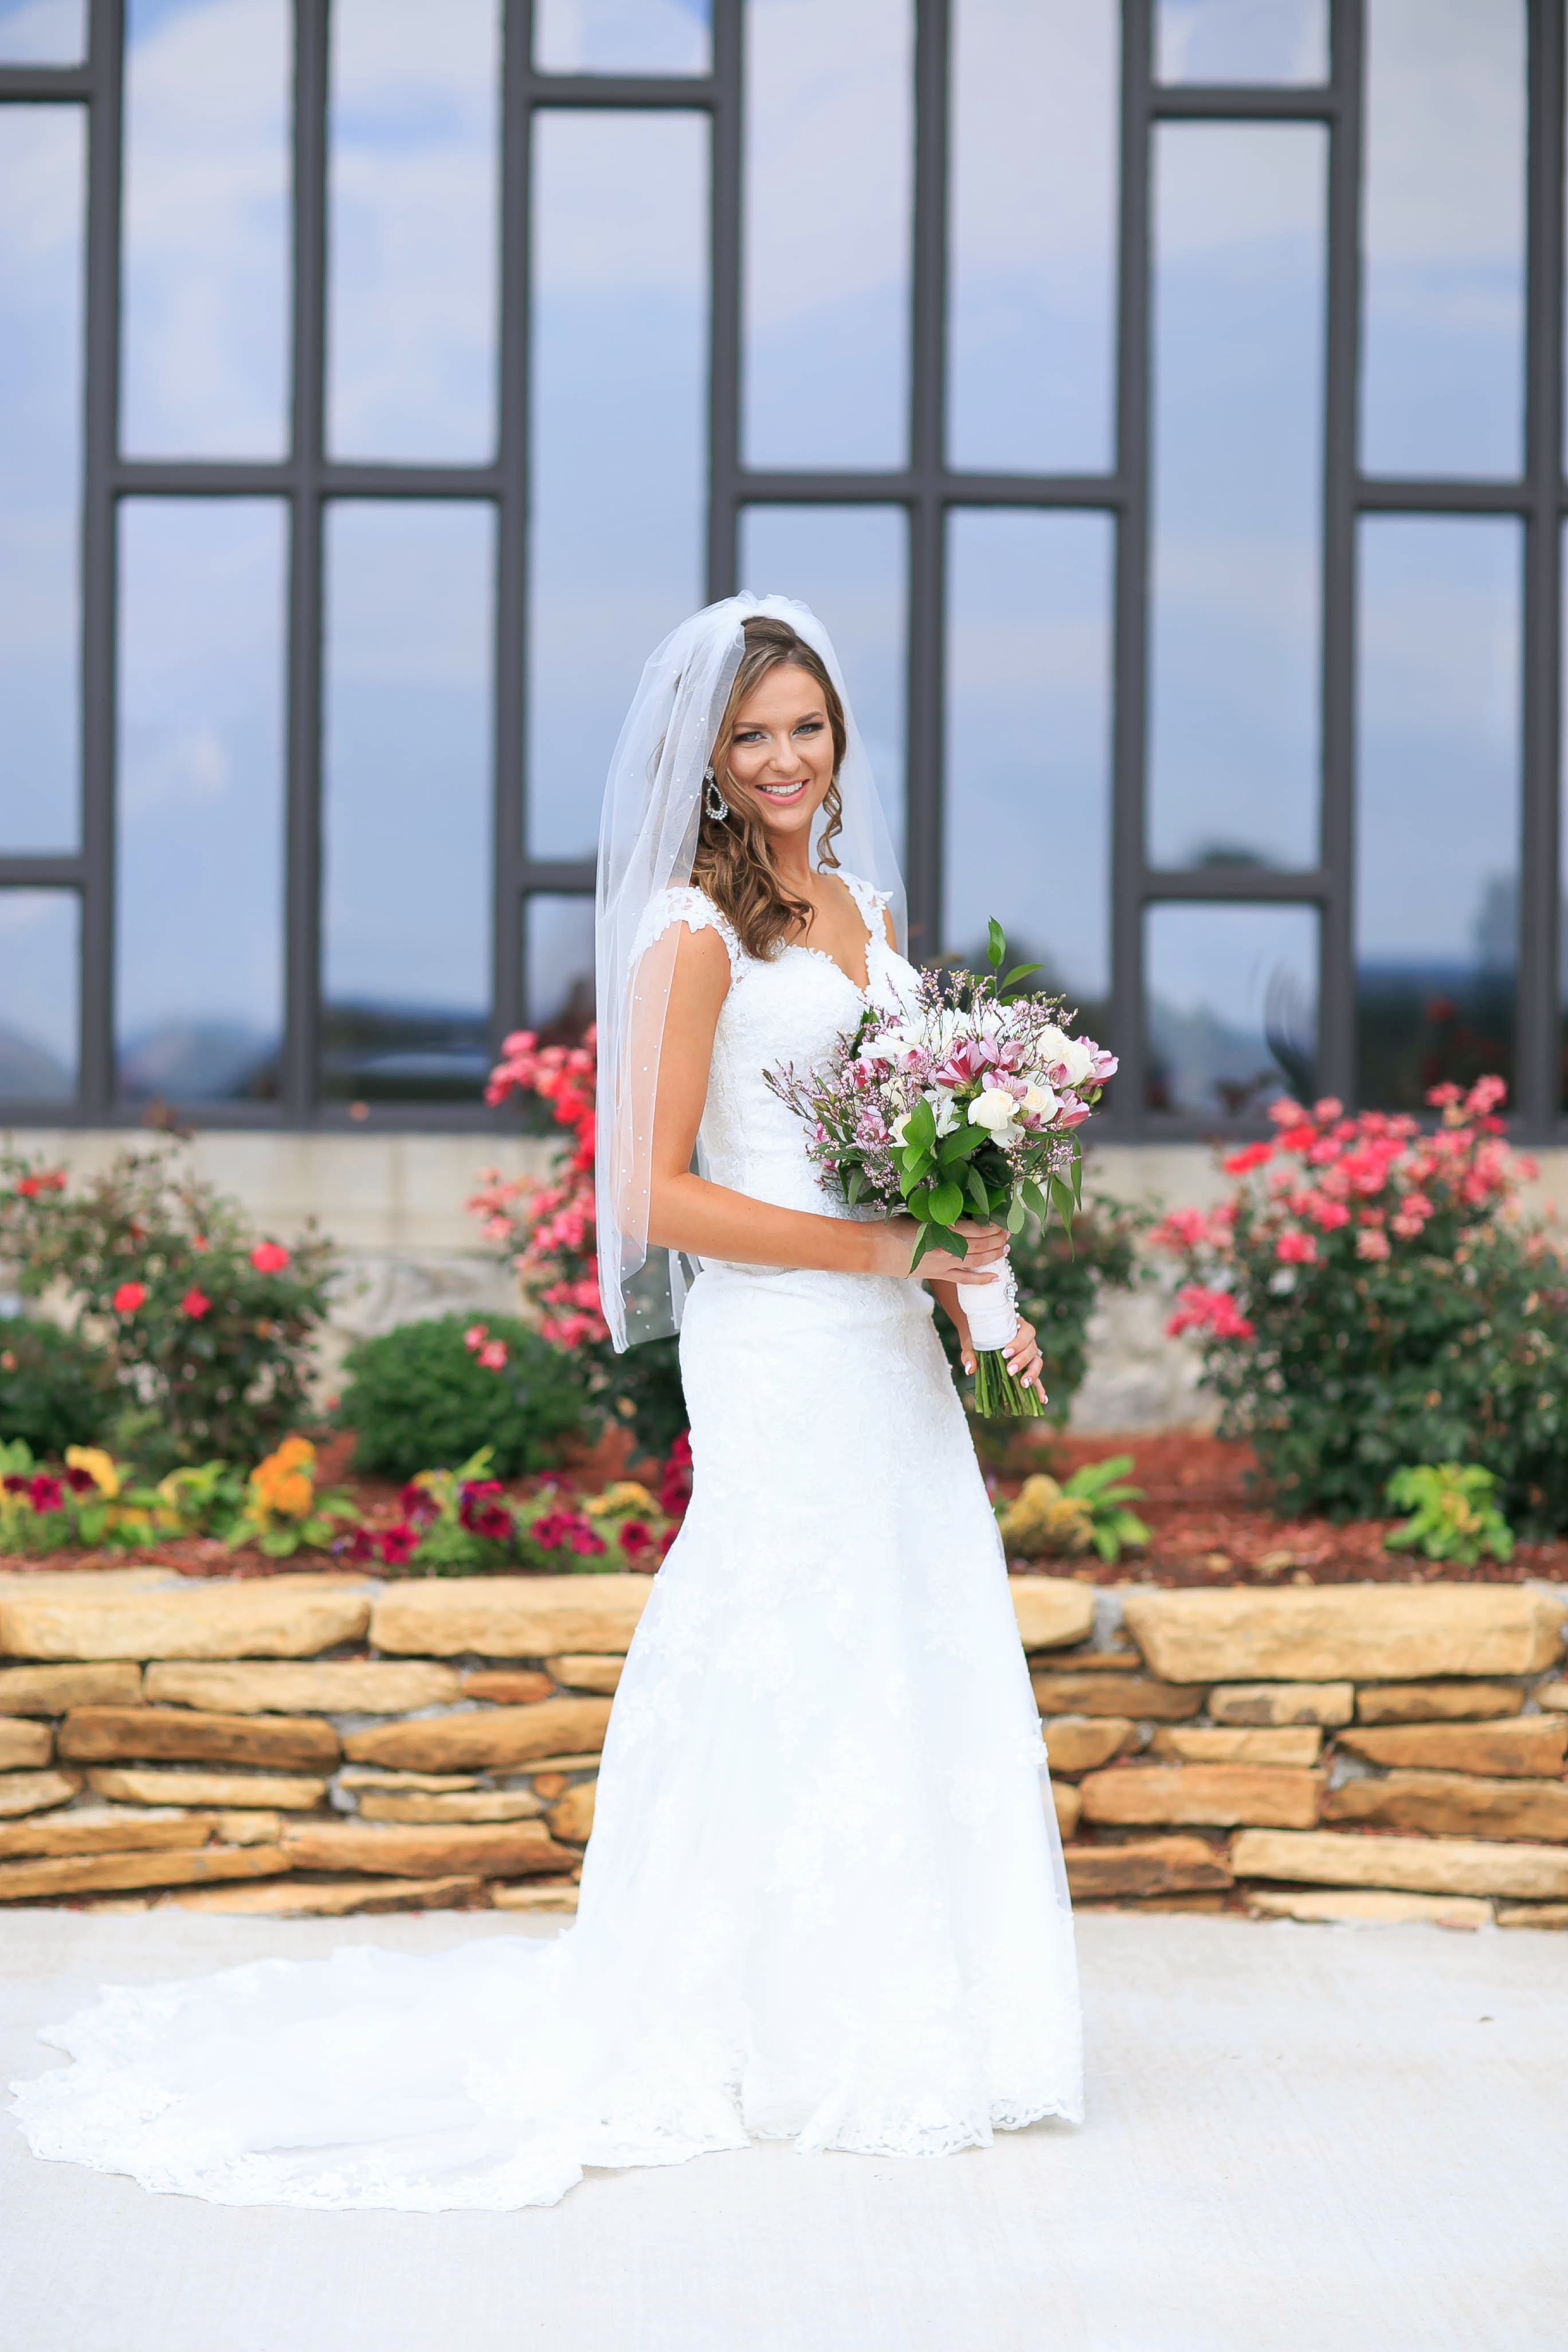 Wedding Photography Bridal Portrait Roundup Cheryl Barker